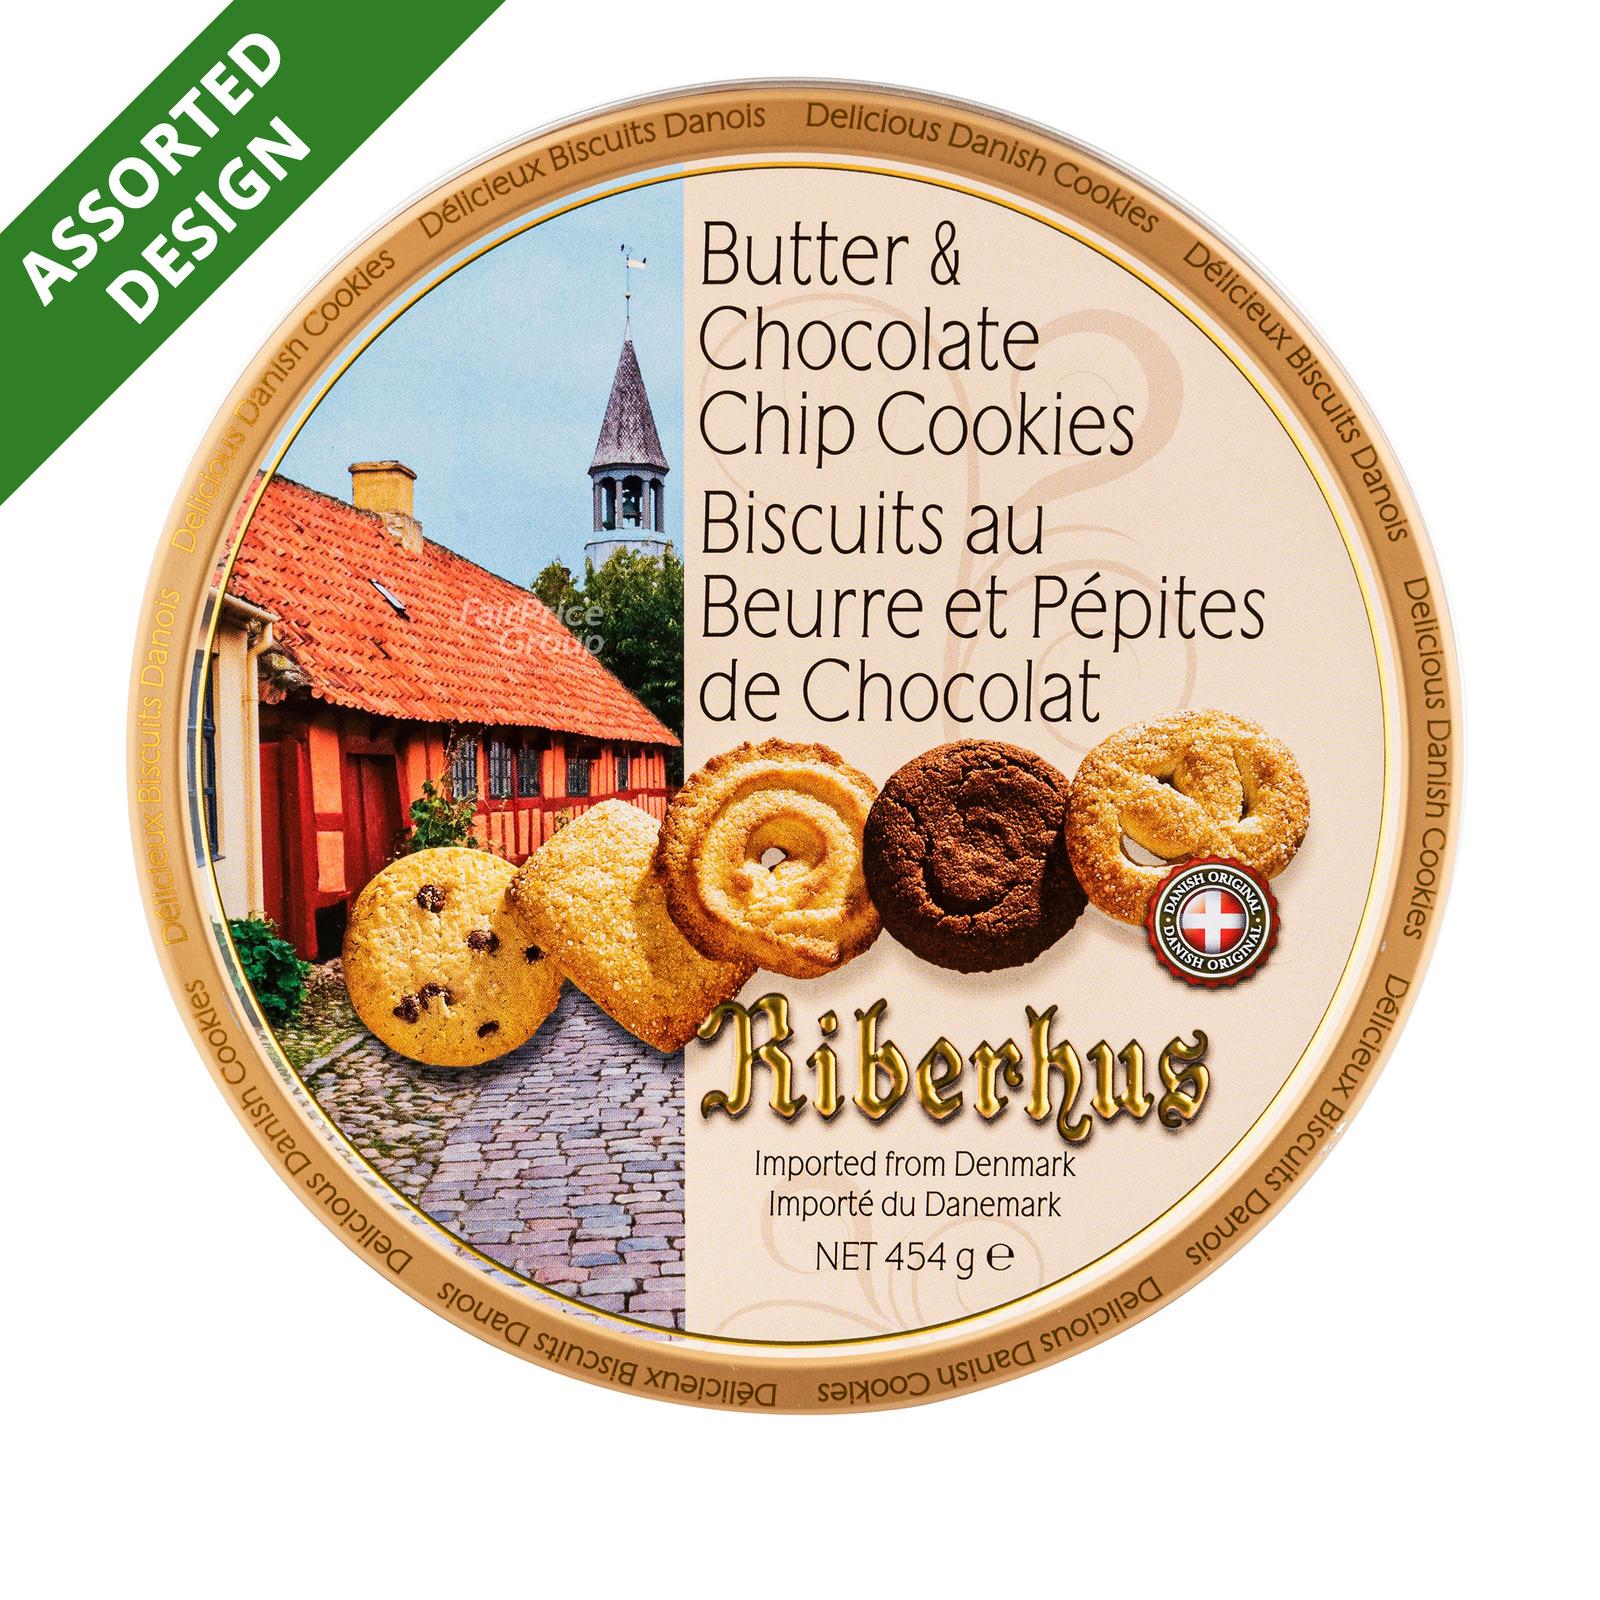 Riberhus Tin Cookies - Butter & Chocolate Chip